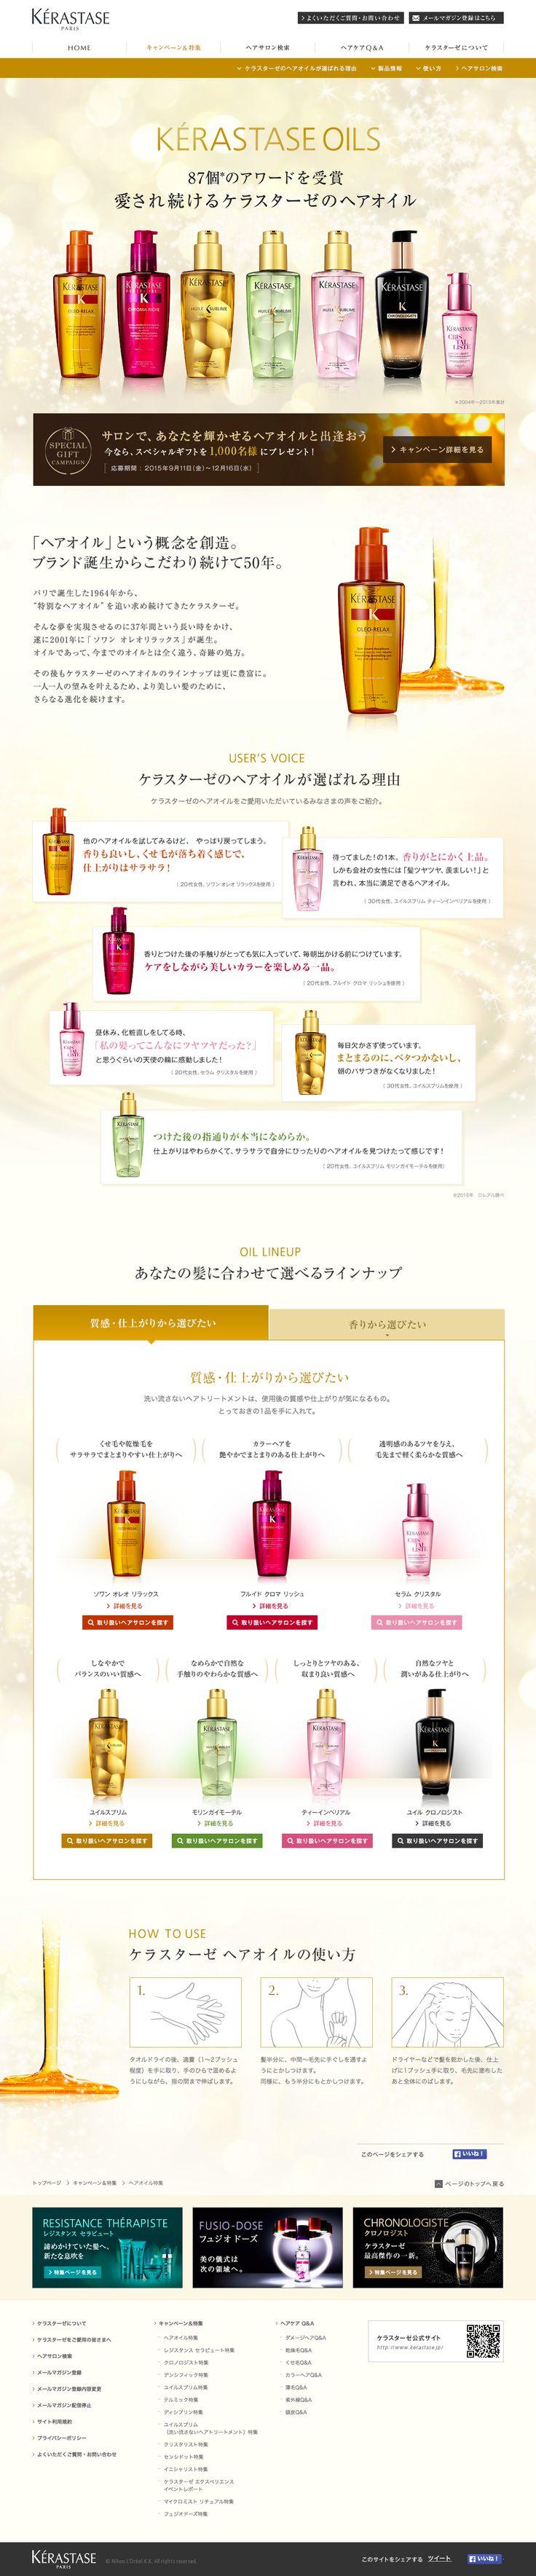 Japanese Webdesign LandingPage Cosmetics